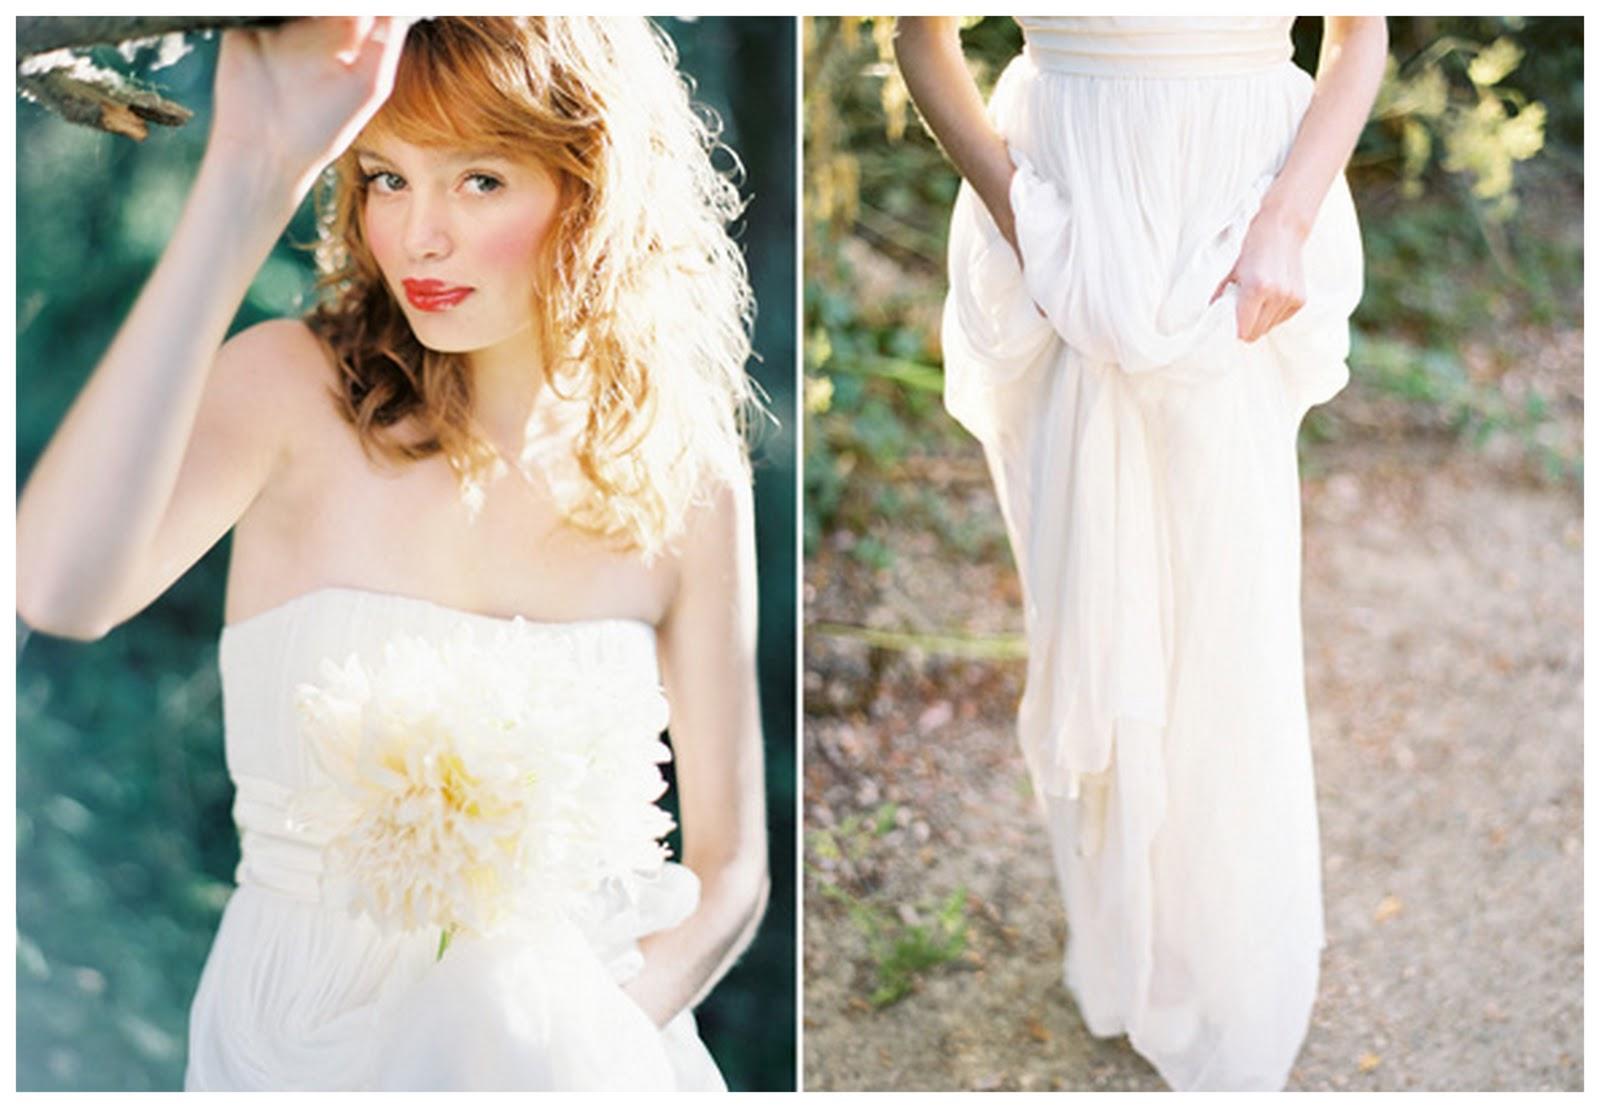 Big Girl Wedding Dress 39 Fabulous Friday March